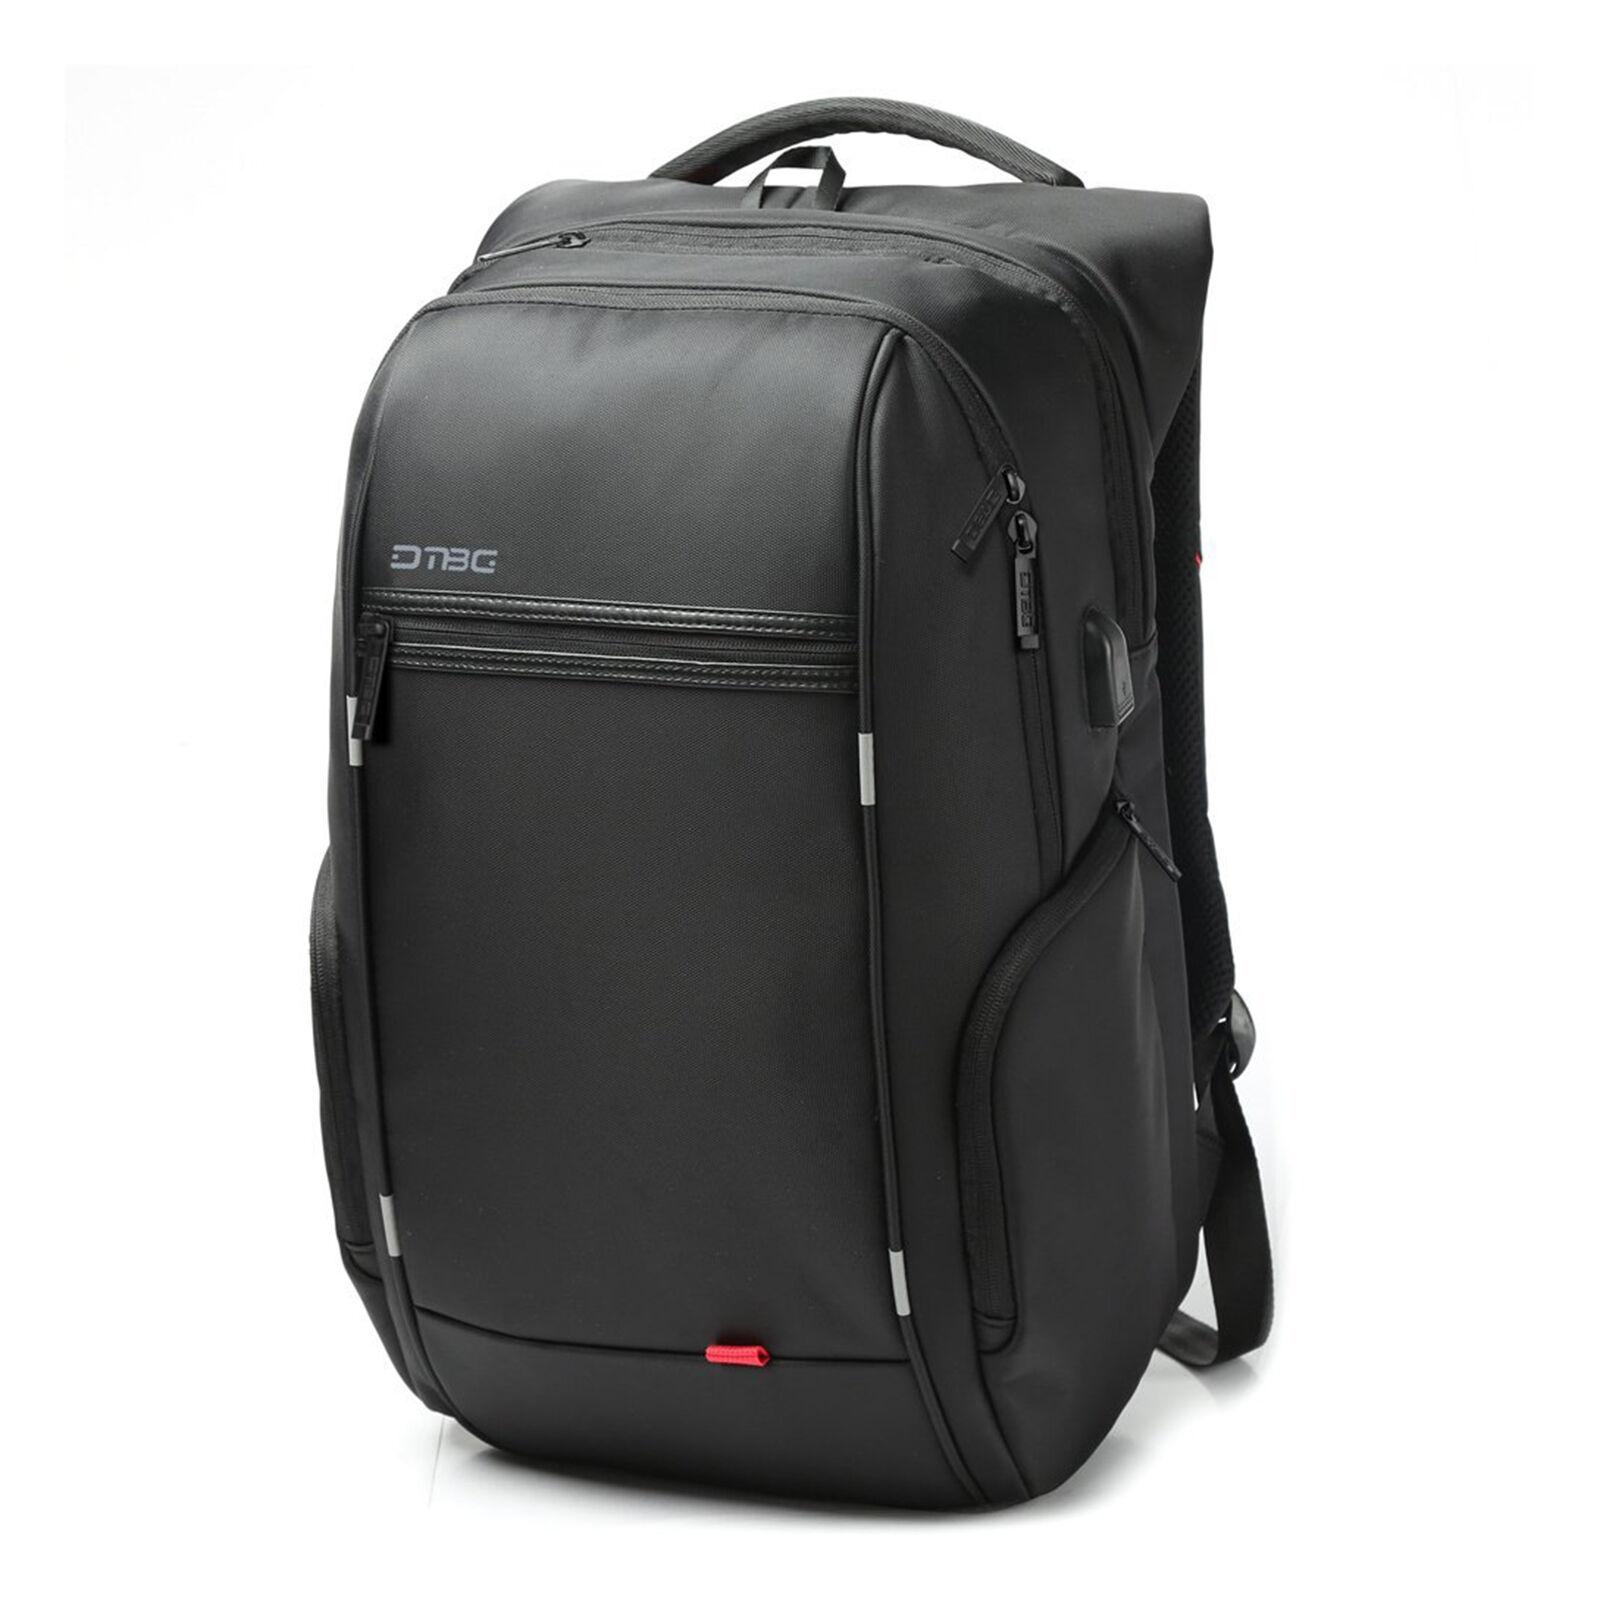 15 zoll laptop rucksack test vergleich 15 zoll laptop. Black Bedroom Furniture Sets. Home Design Ideas